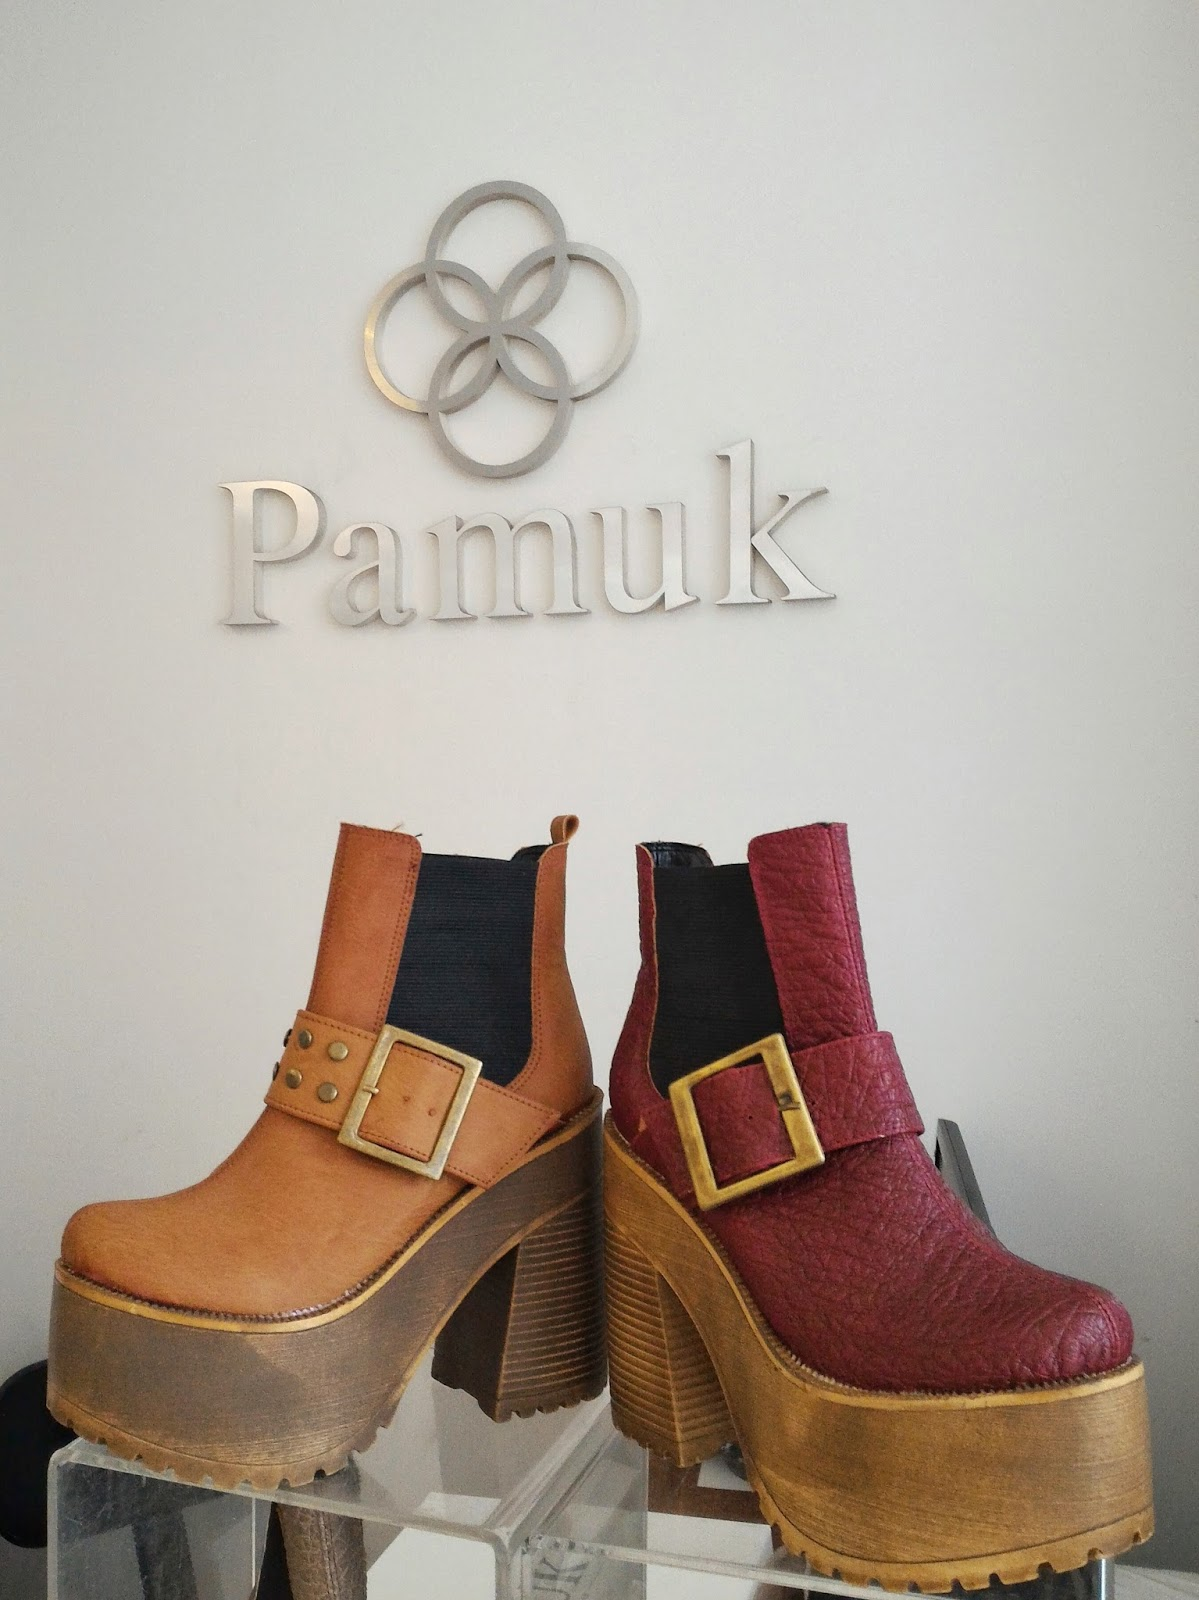 Pamuk by Trendhuntingbuenosaires